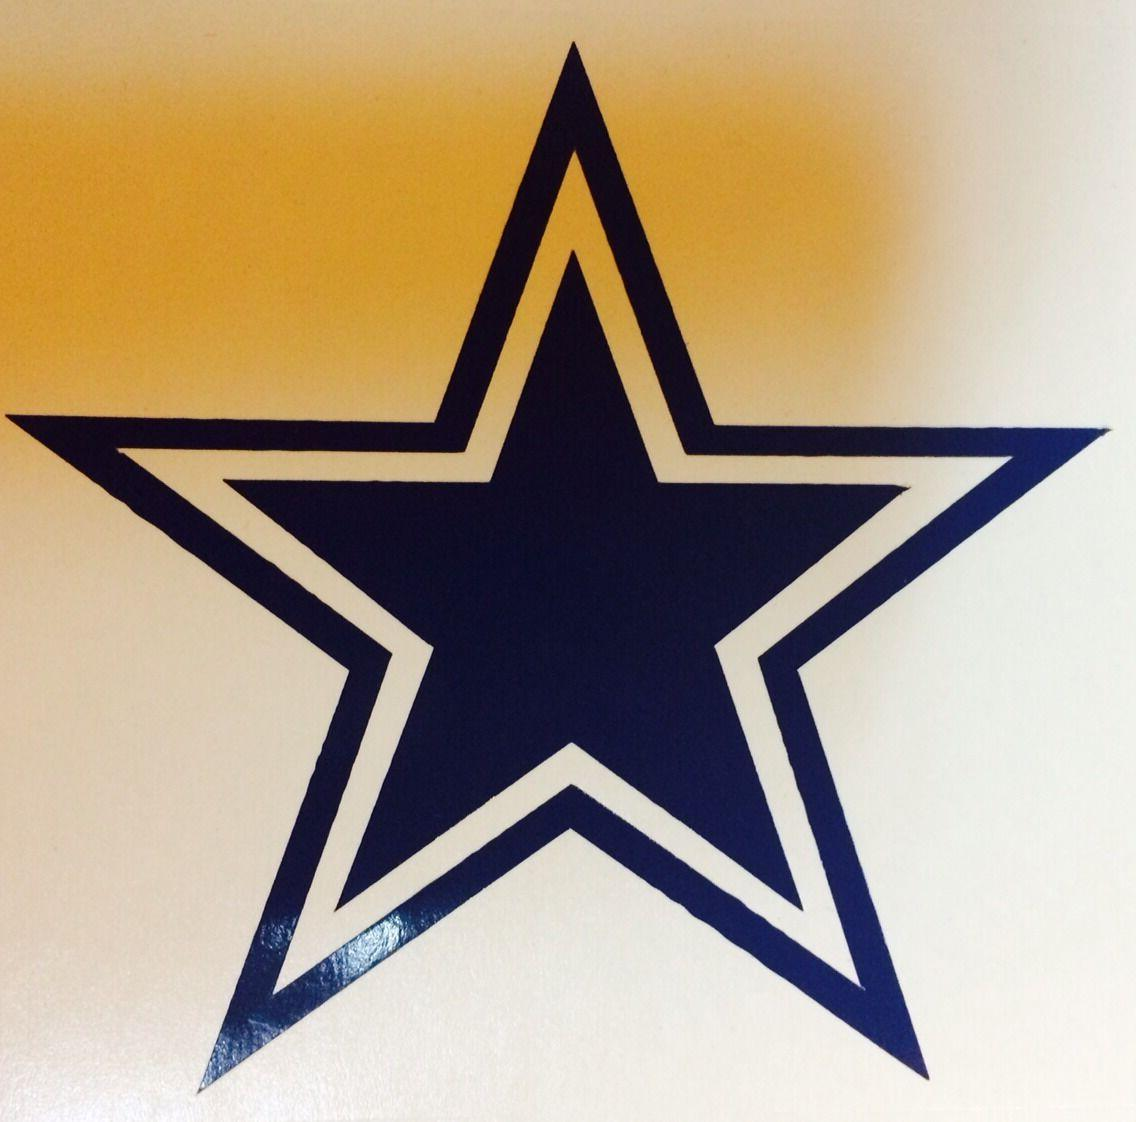 Dallas Star 2 Decal**FREE